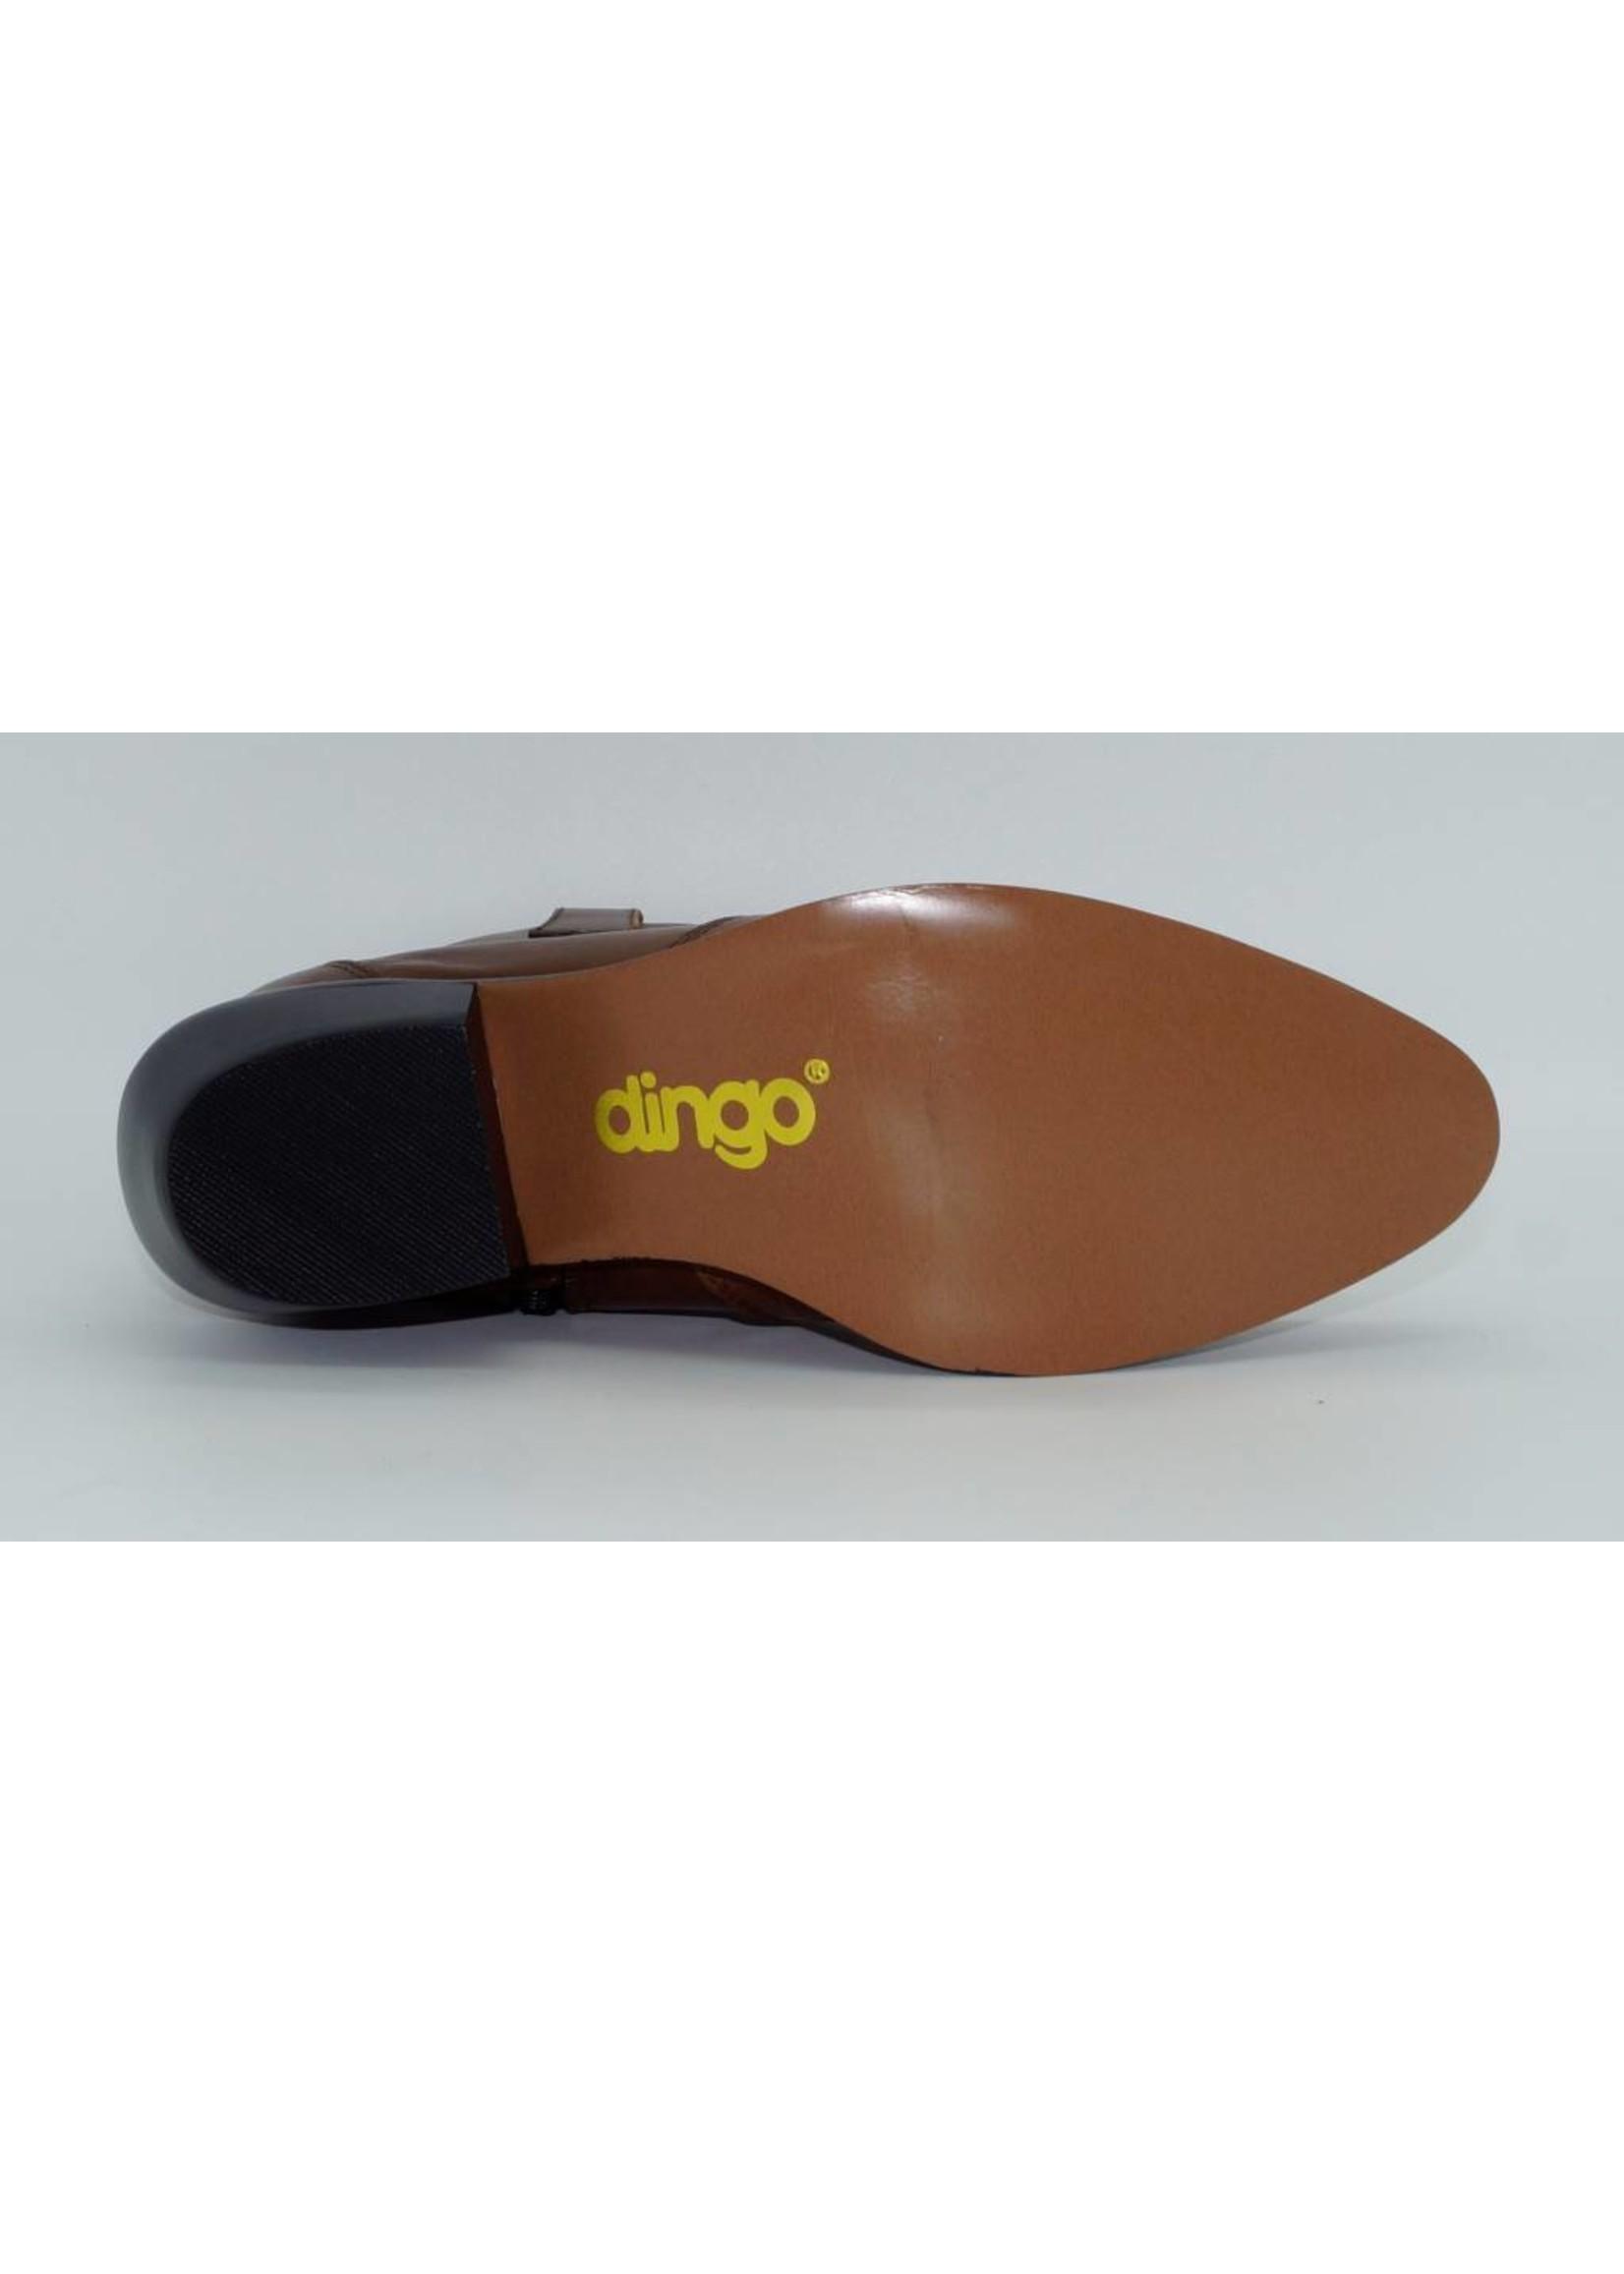 Dingo Women's Tan Short Western Boot DI562